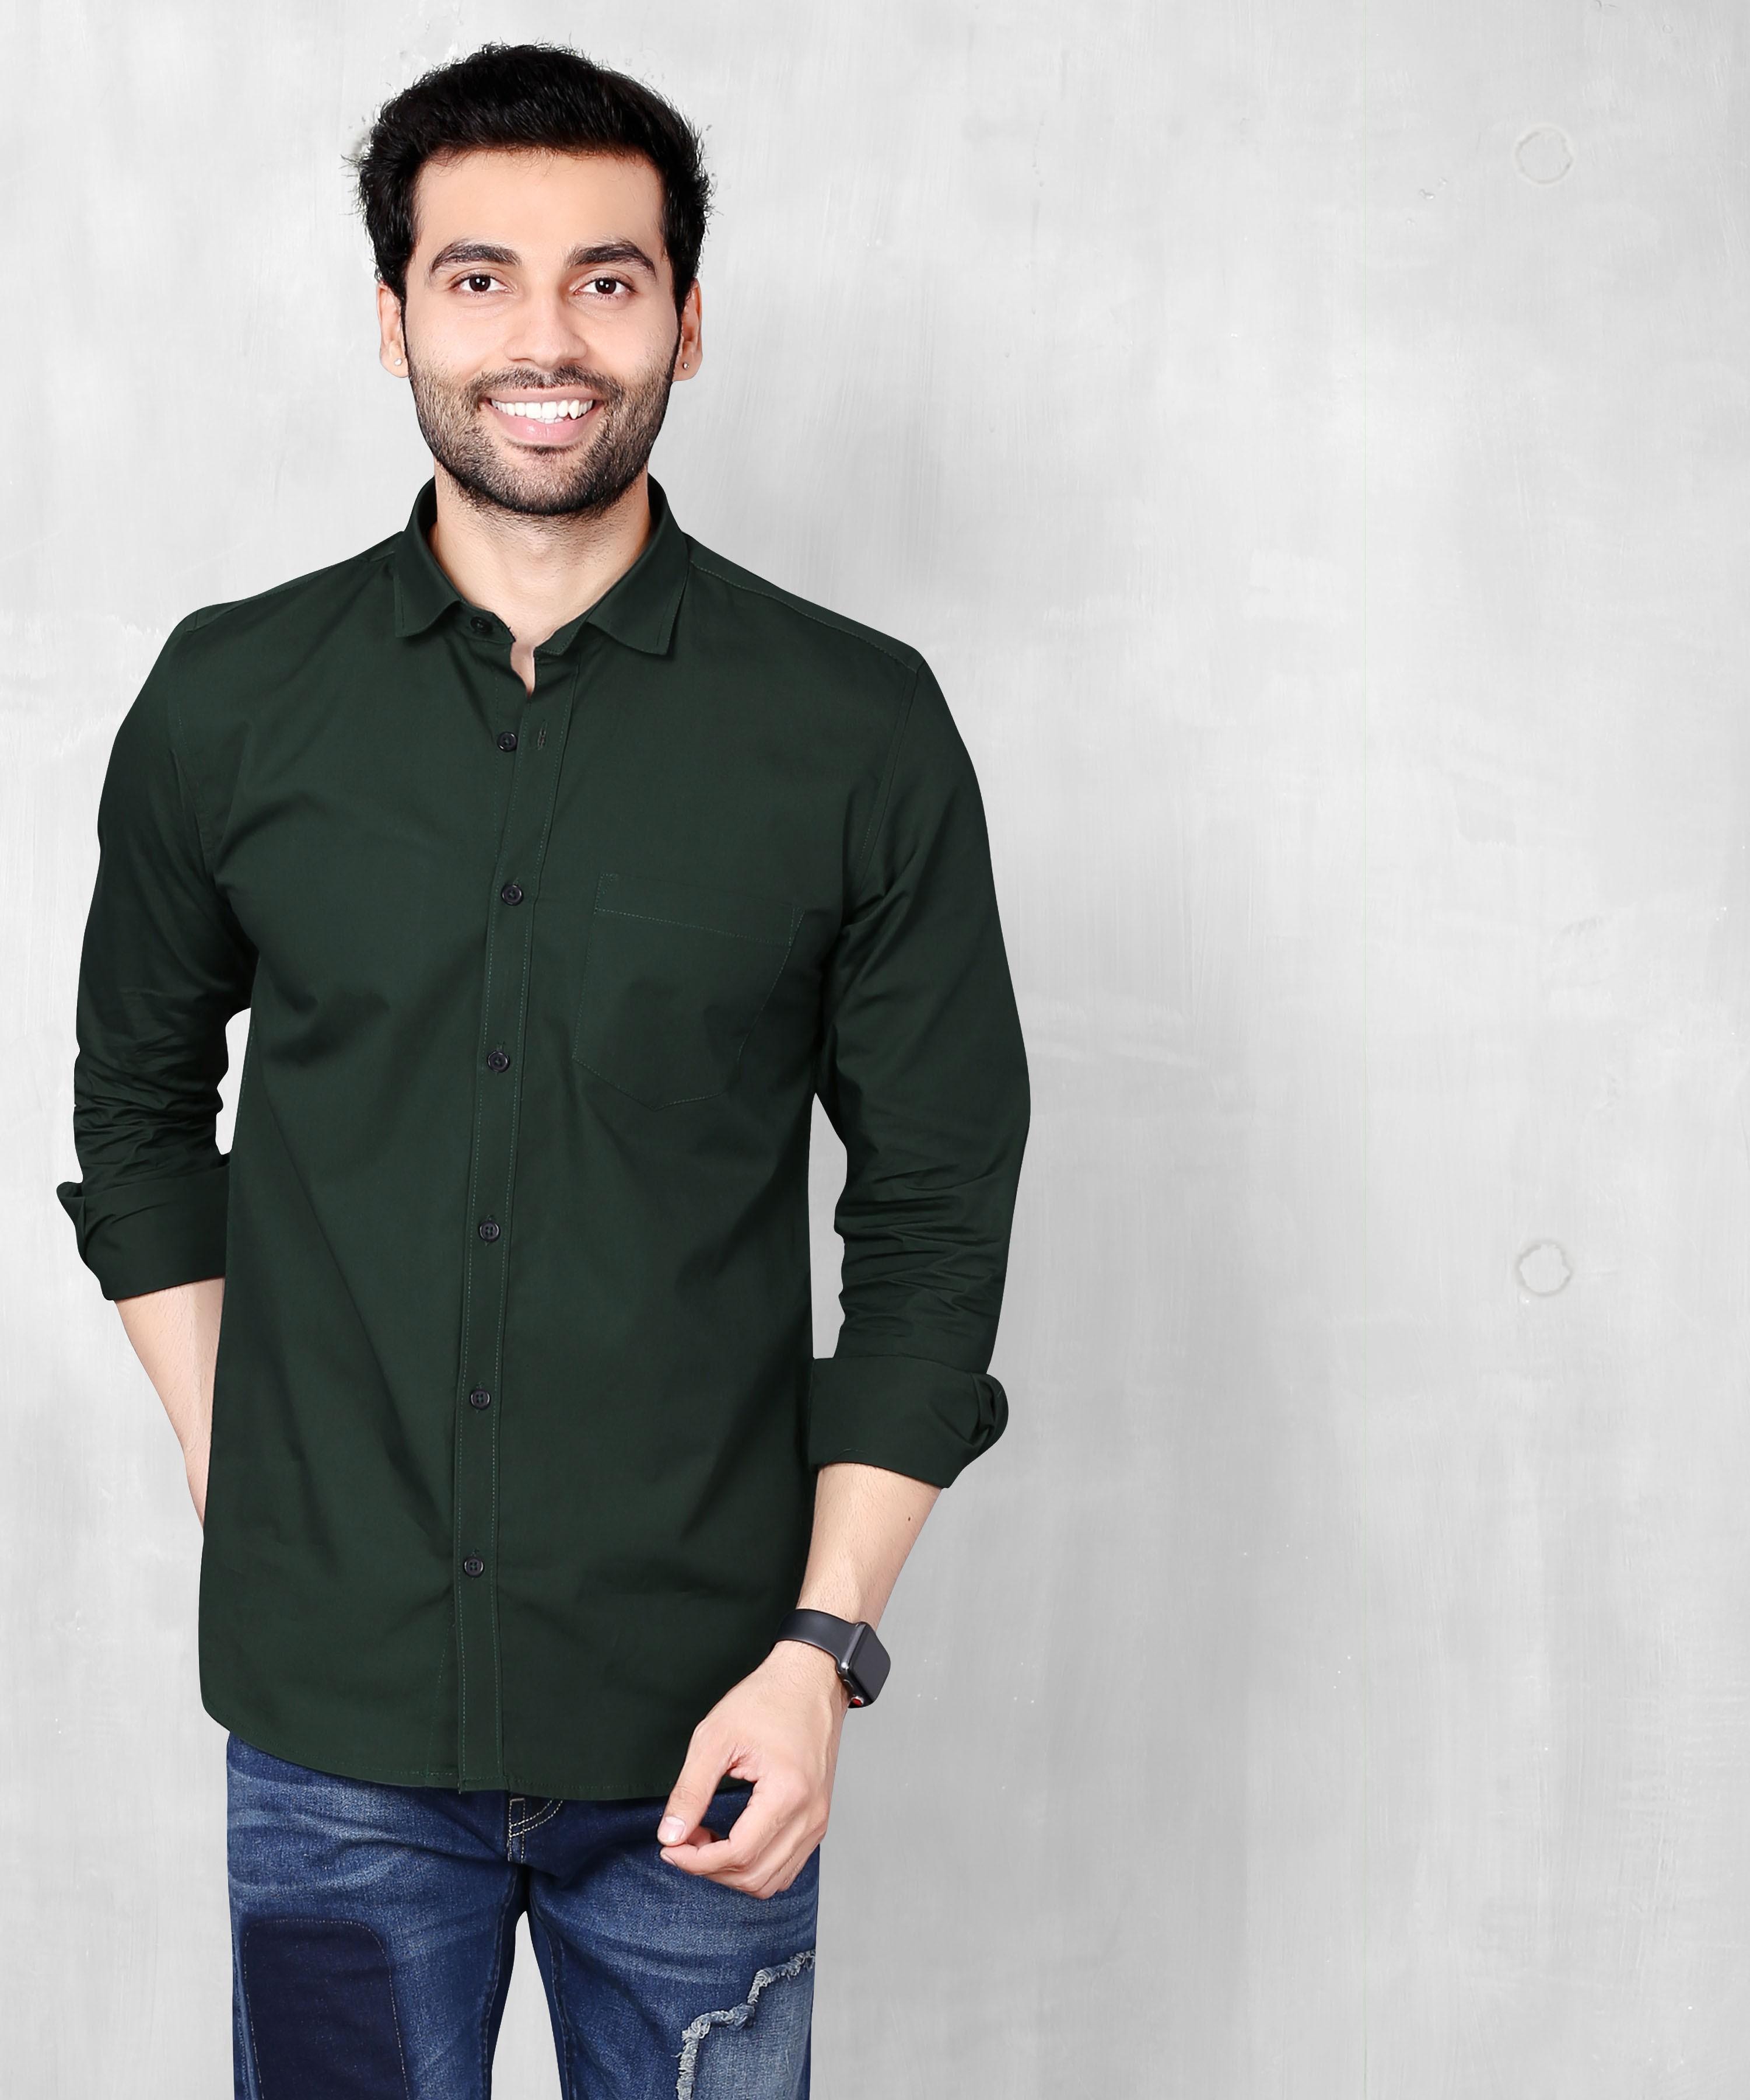 FIFTH ANFOLD Men's Bottle Green Casual Slim Collar Full/Long Sleev Slim Fit Shirt